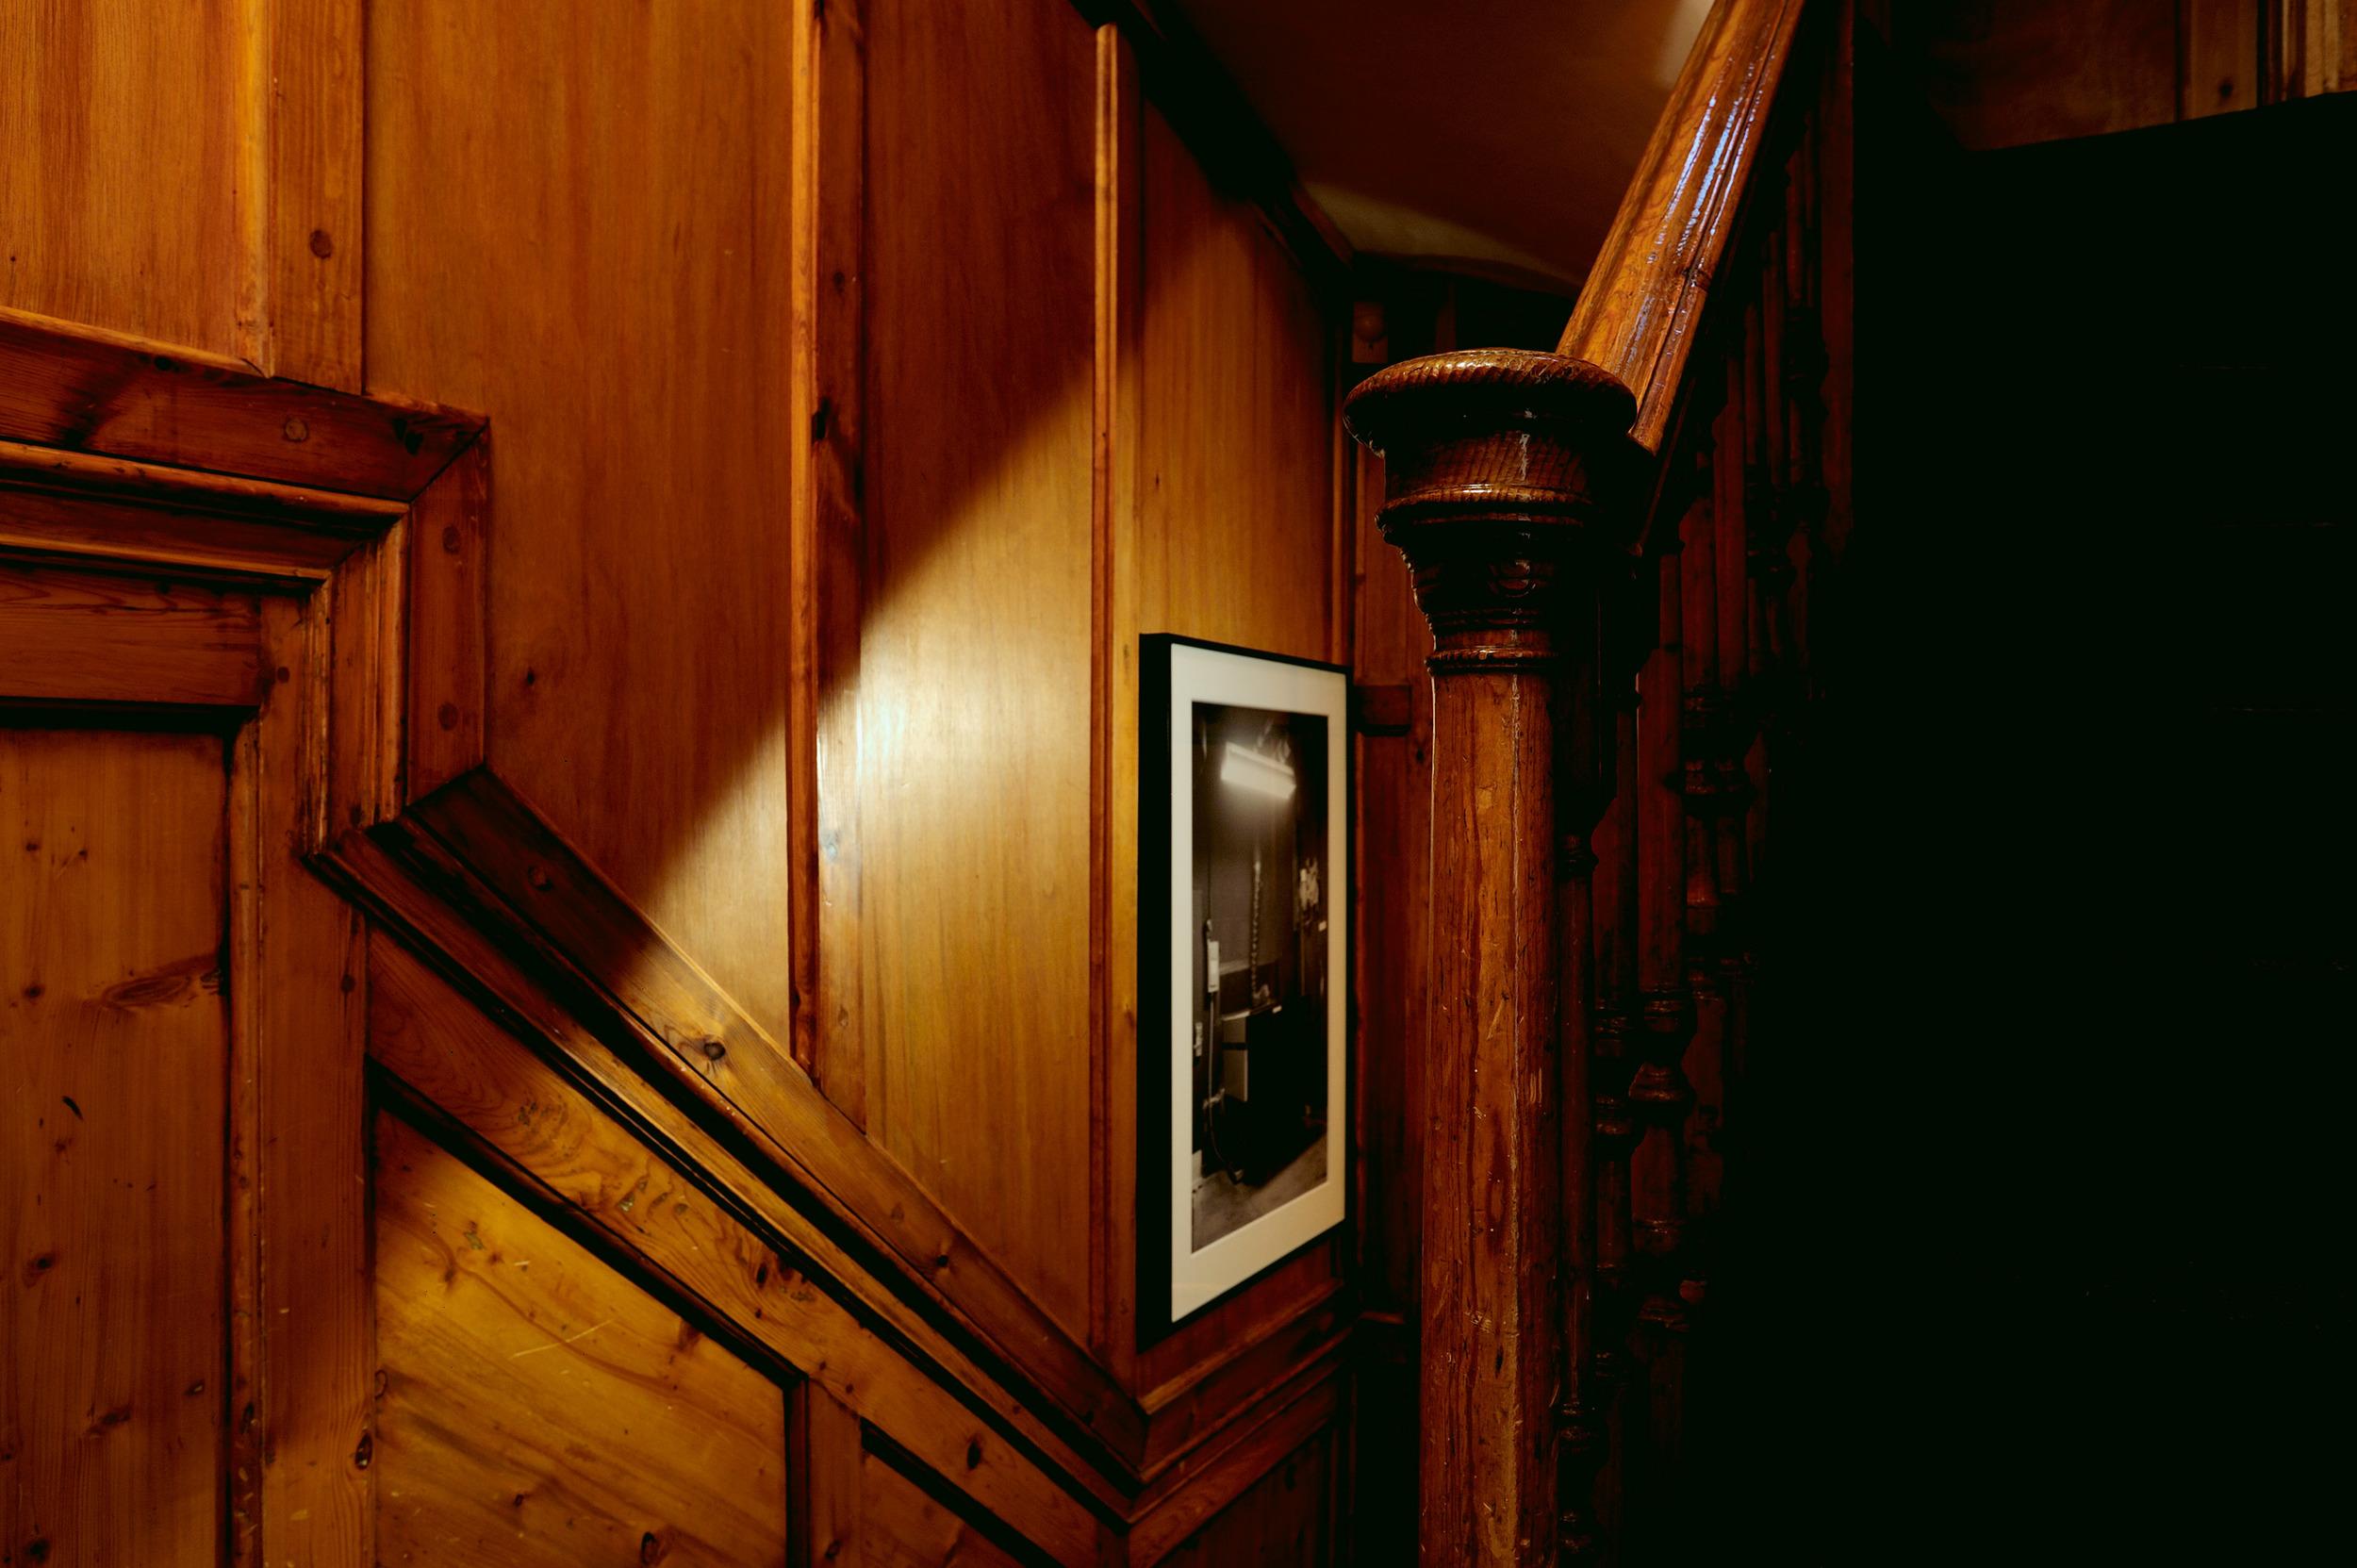 Production Stills   Thomas Dane Gallery  London  United Kingdom  2009